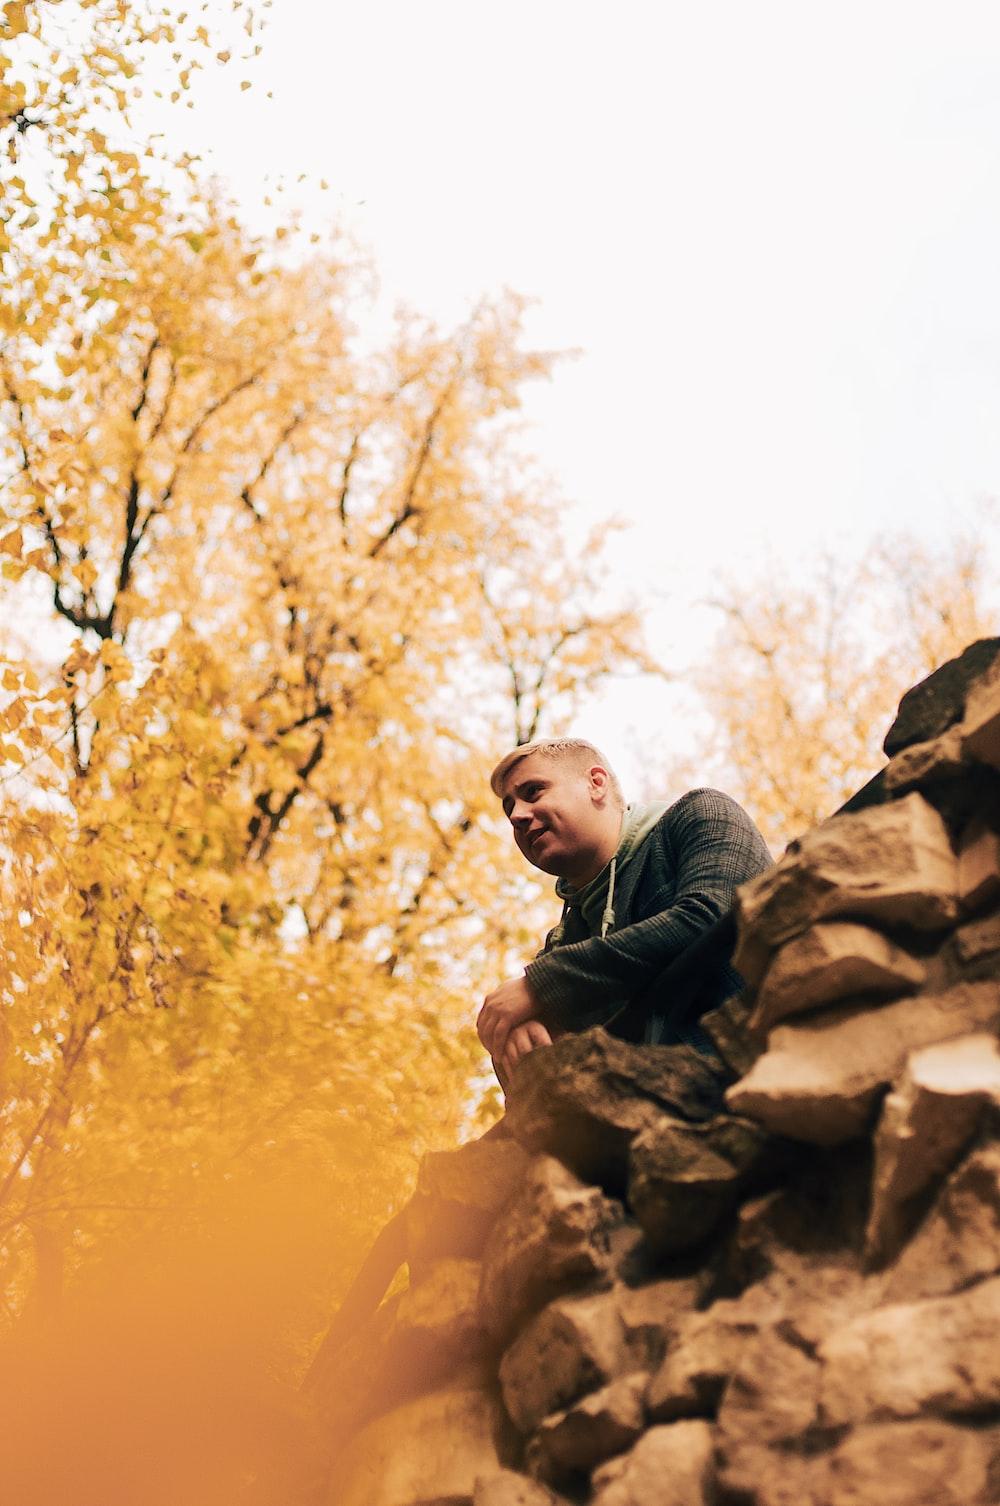 man wears black jacket sitting near yellow-leafed tree